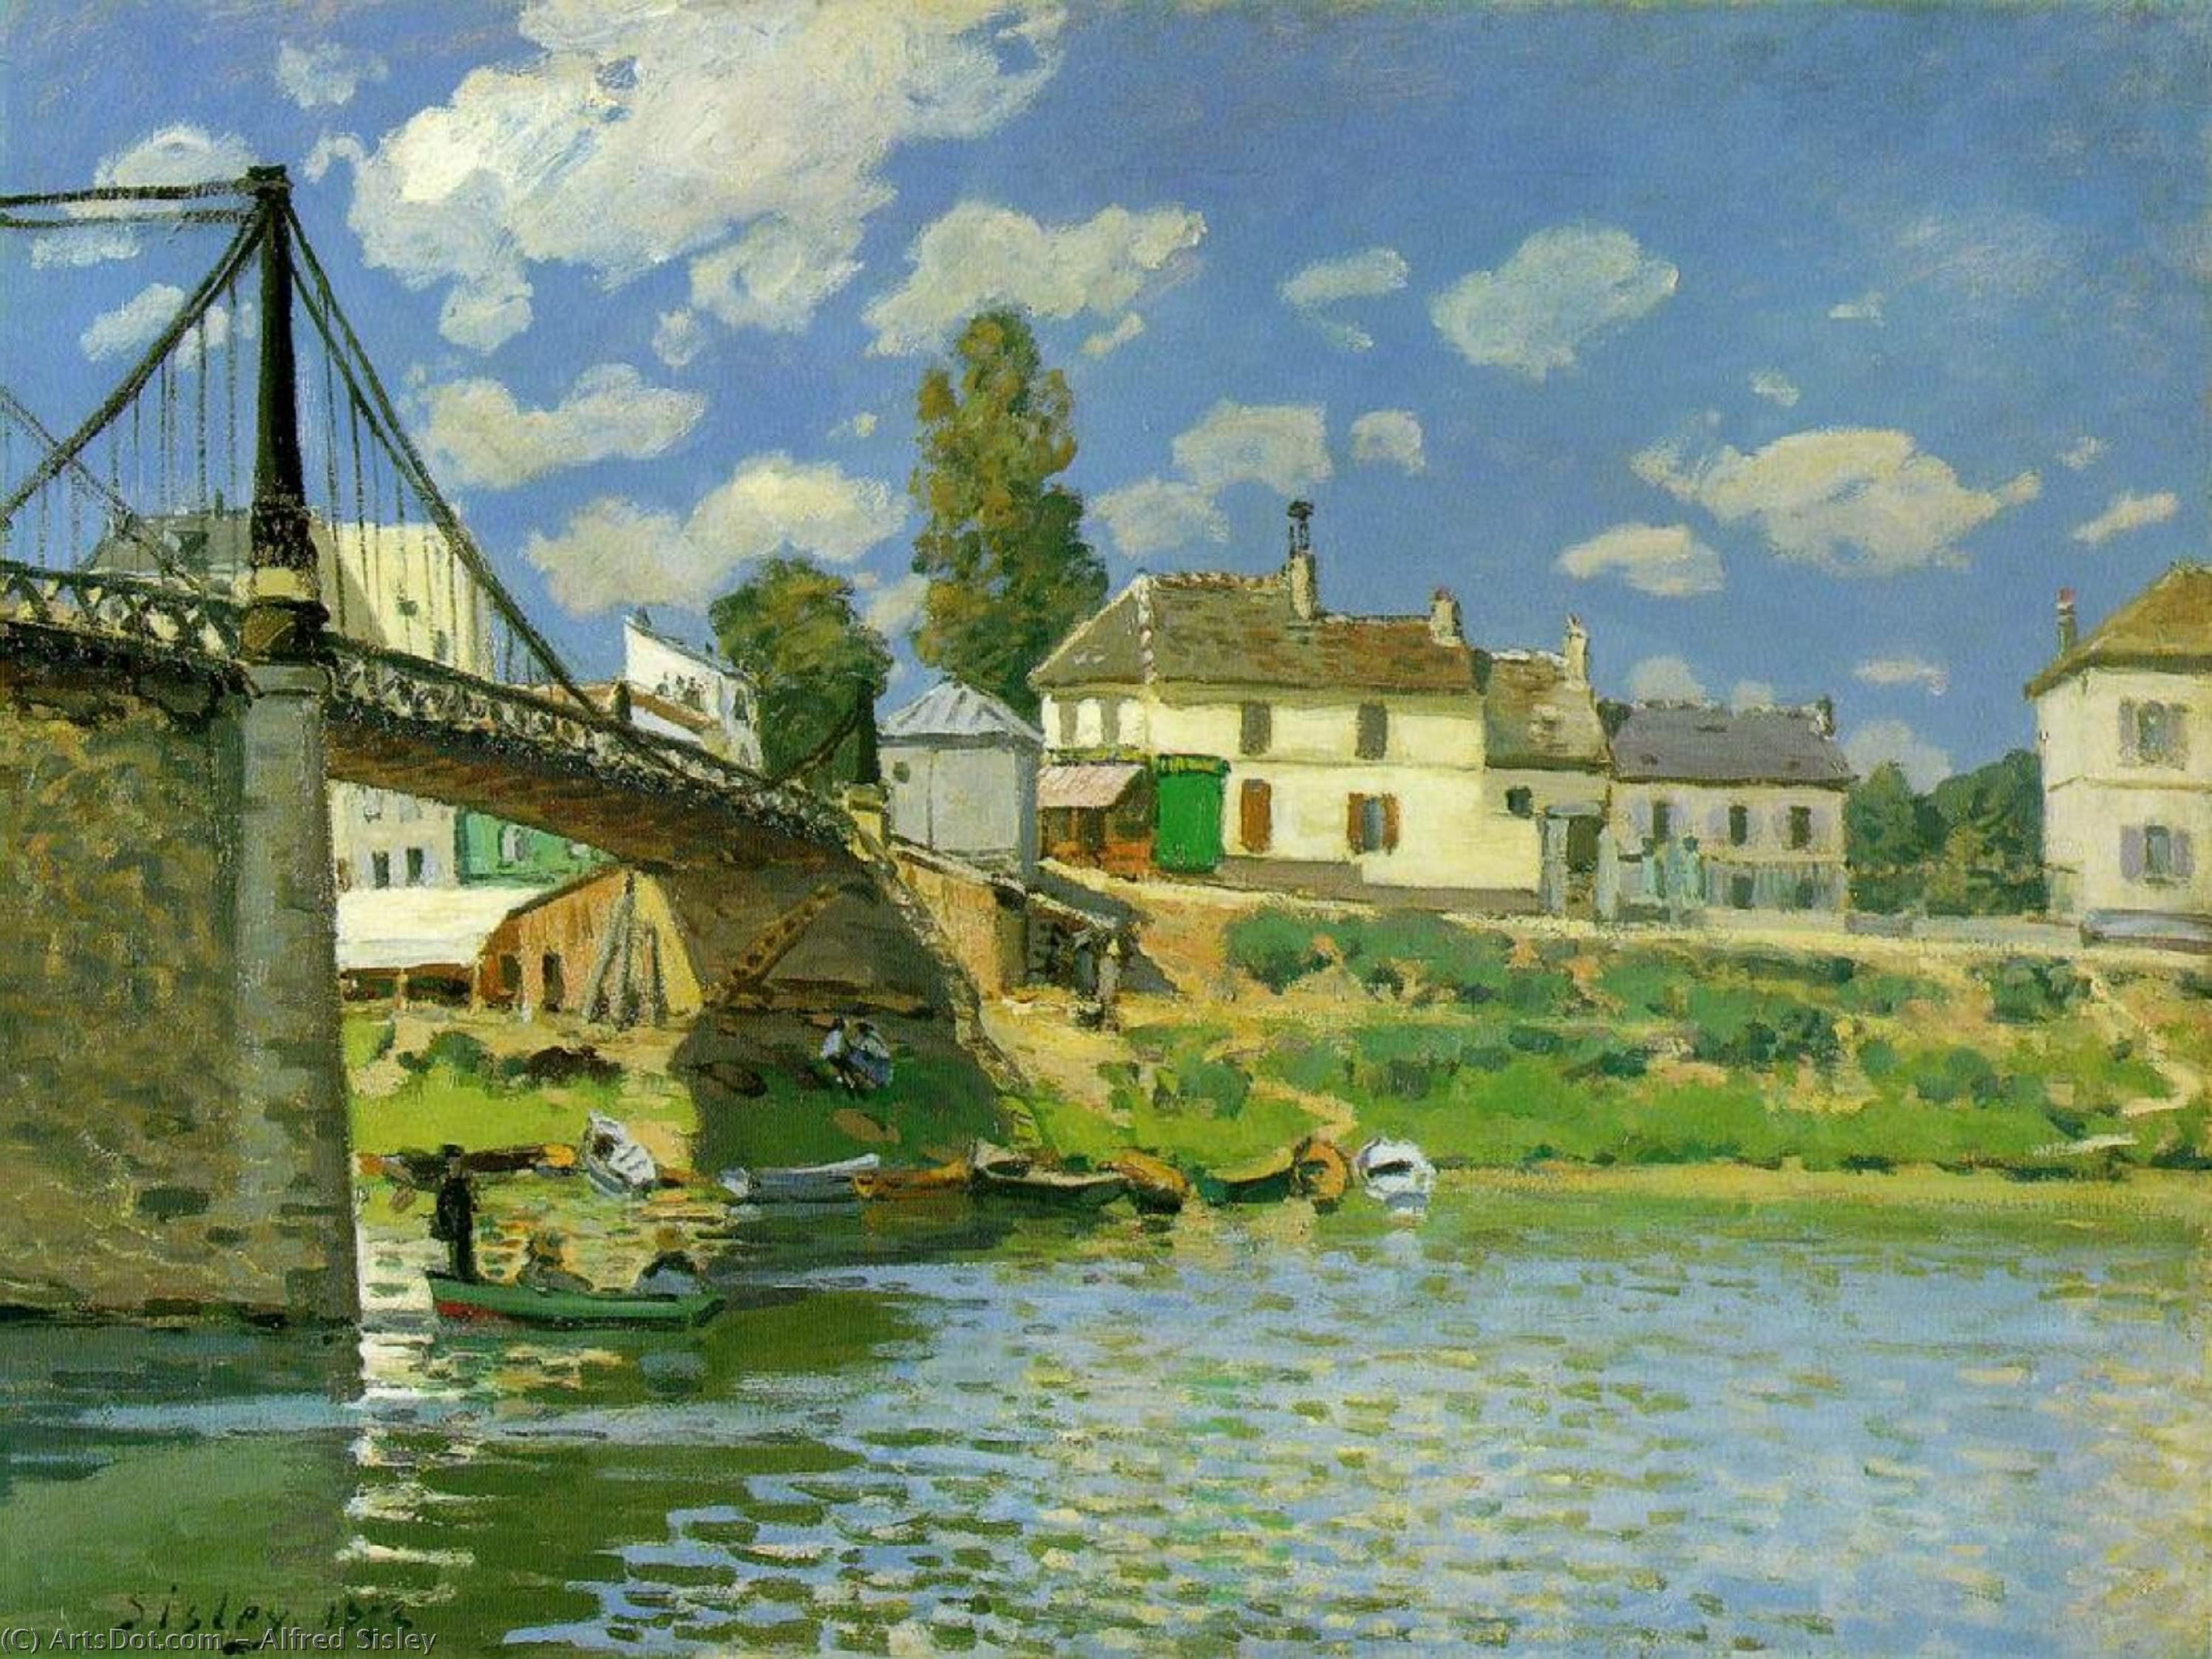 Wikioo.org - The Encyclopedia of Fine Arts - Painting, Artwork by Alfred Sisley - Bridge at Villeneuve la Garenne - -